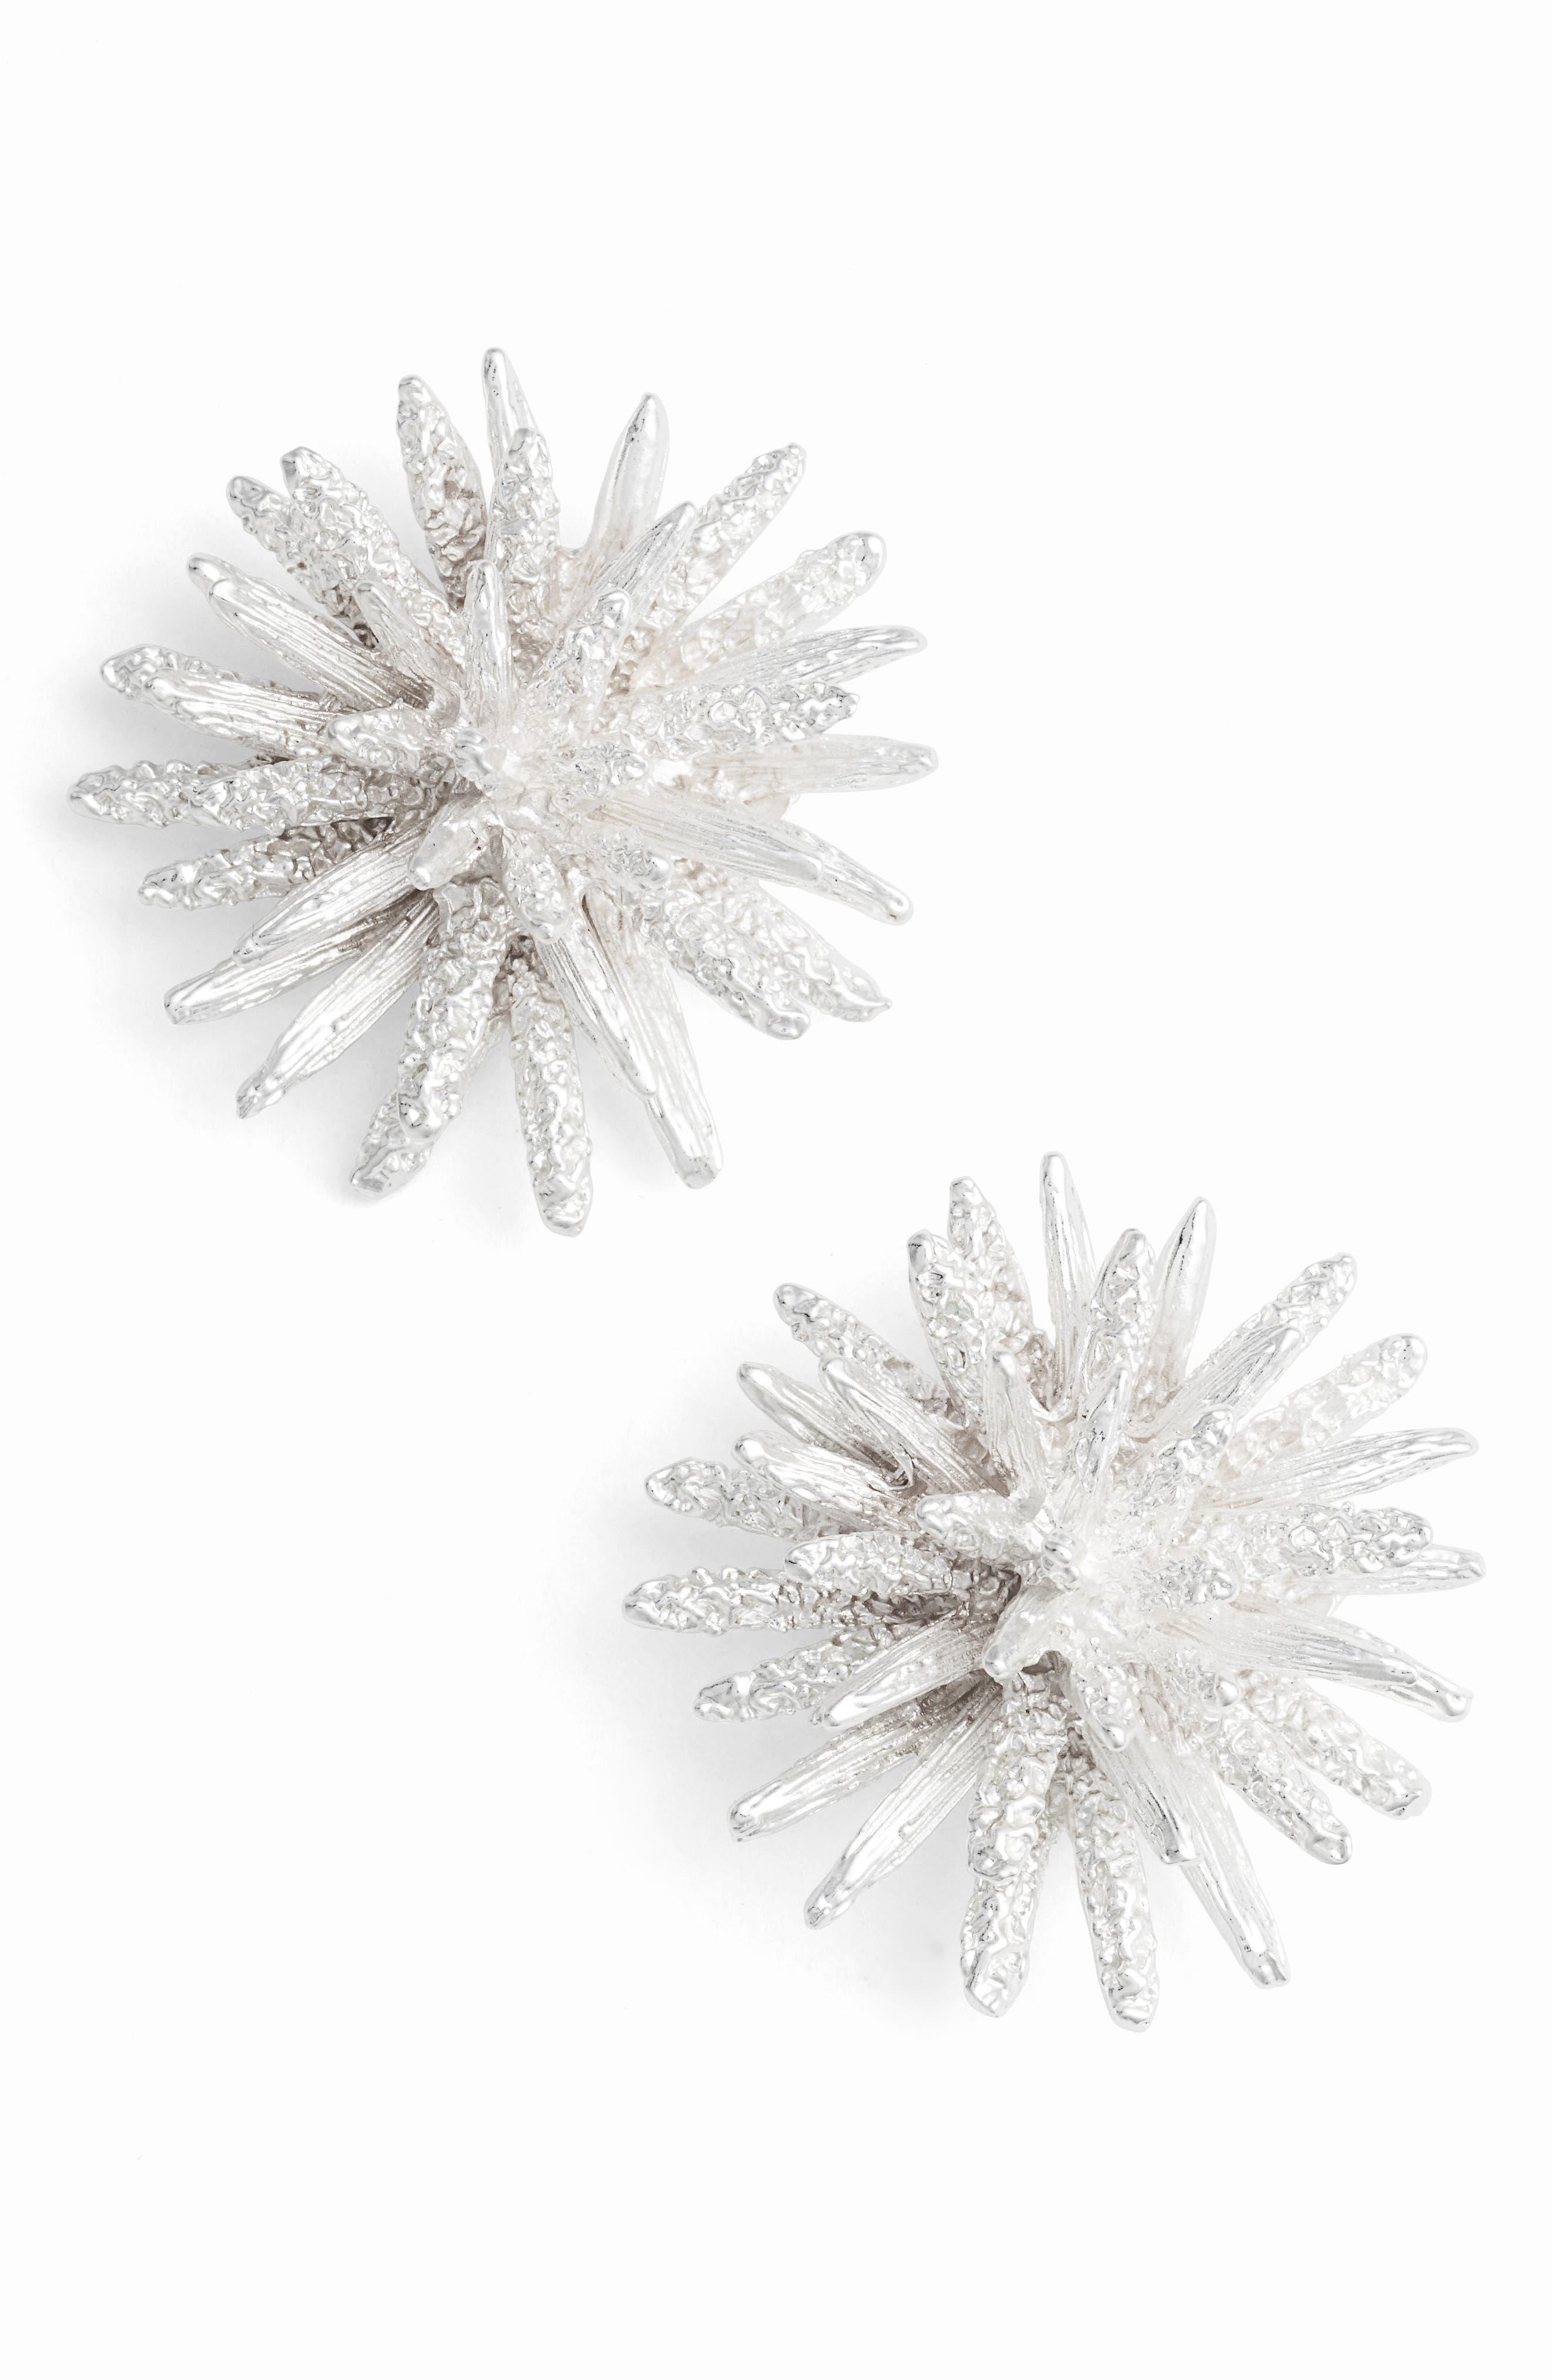 Large Stud Earrings,                             Main thumbnail 1, color,                             Silver